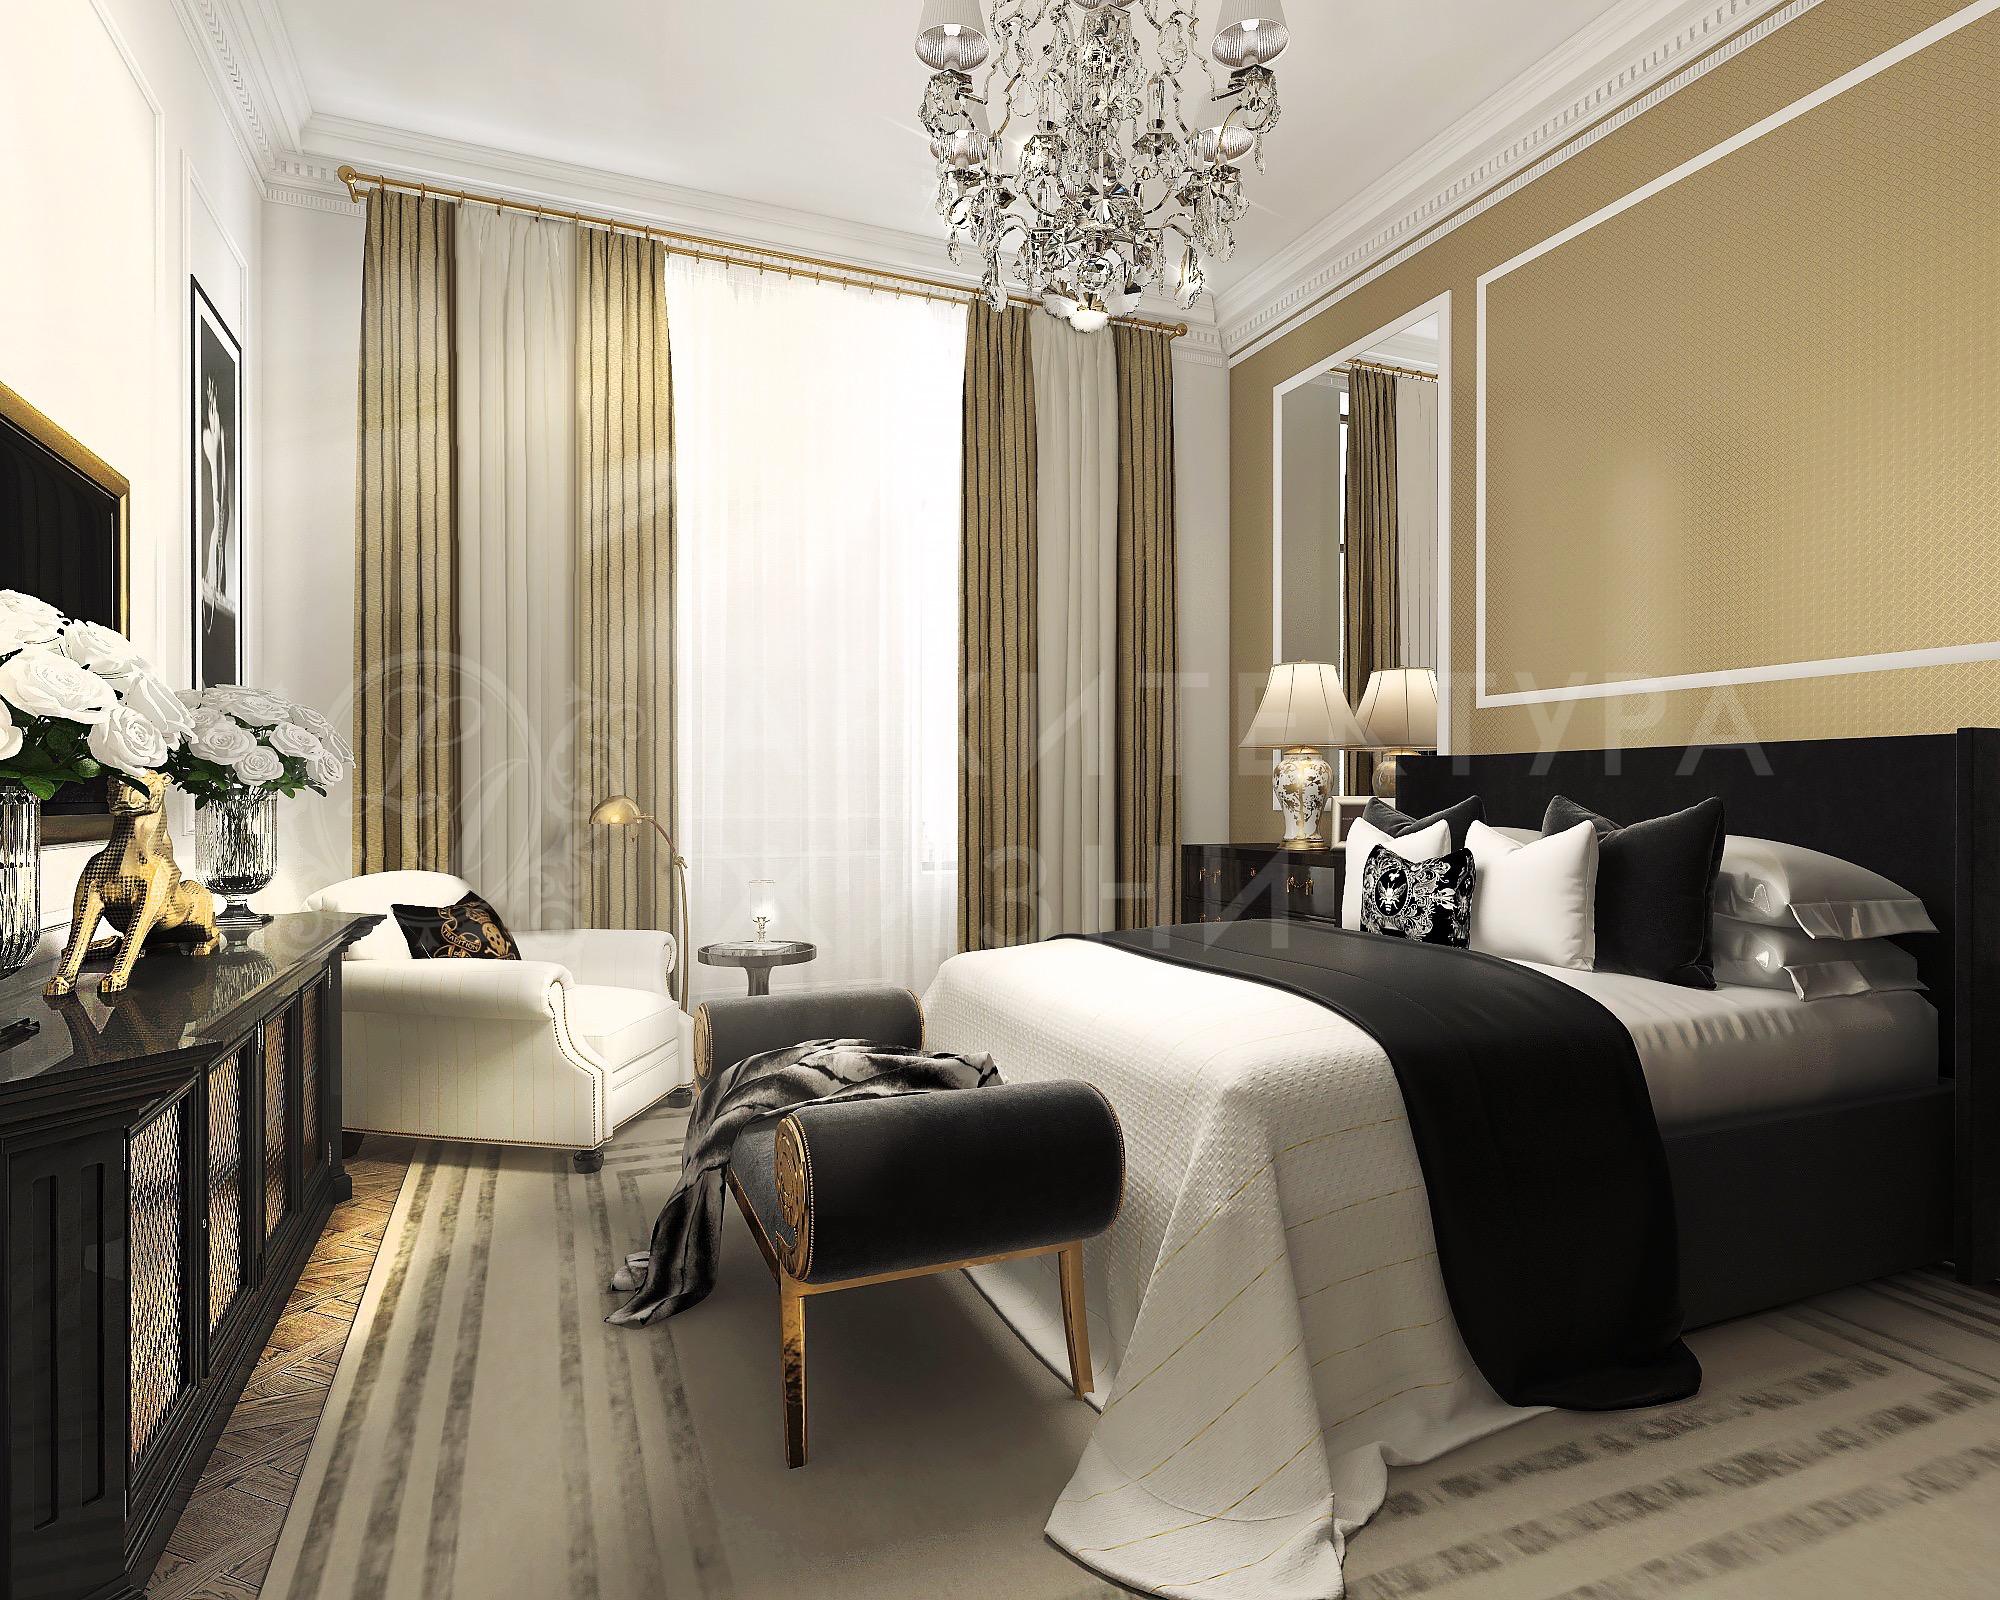 гостевая спальня 1 1.jpg